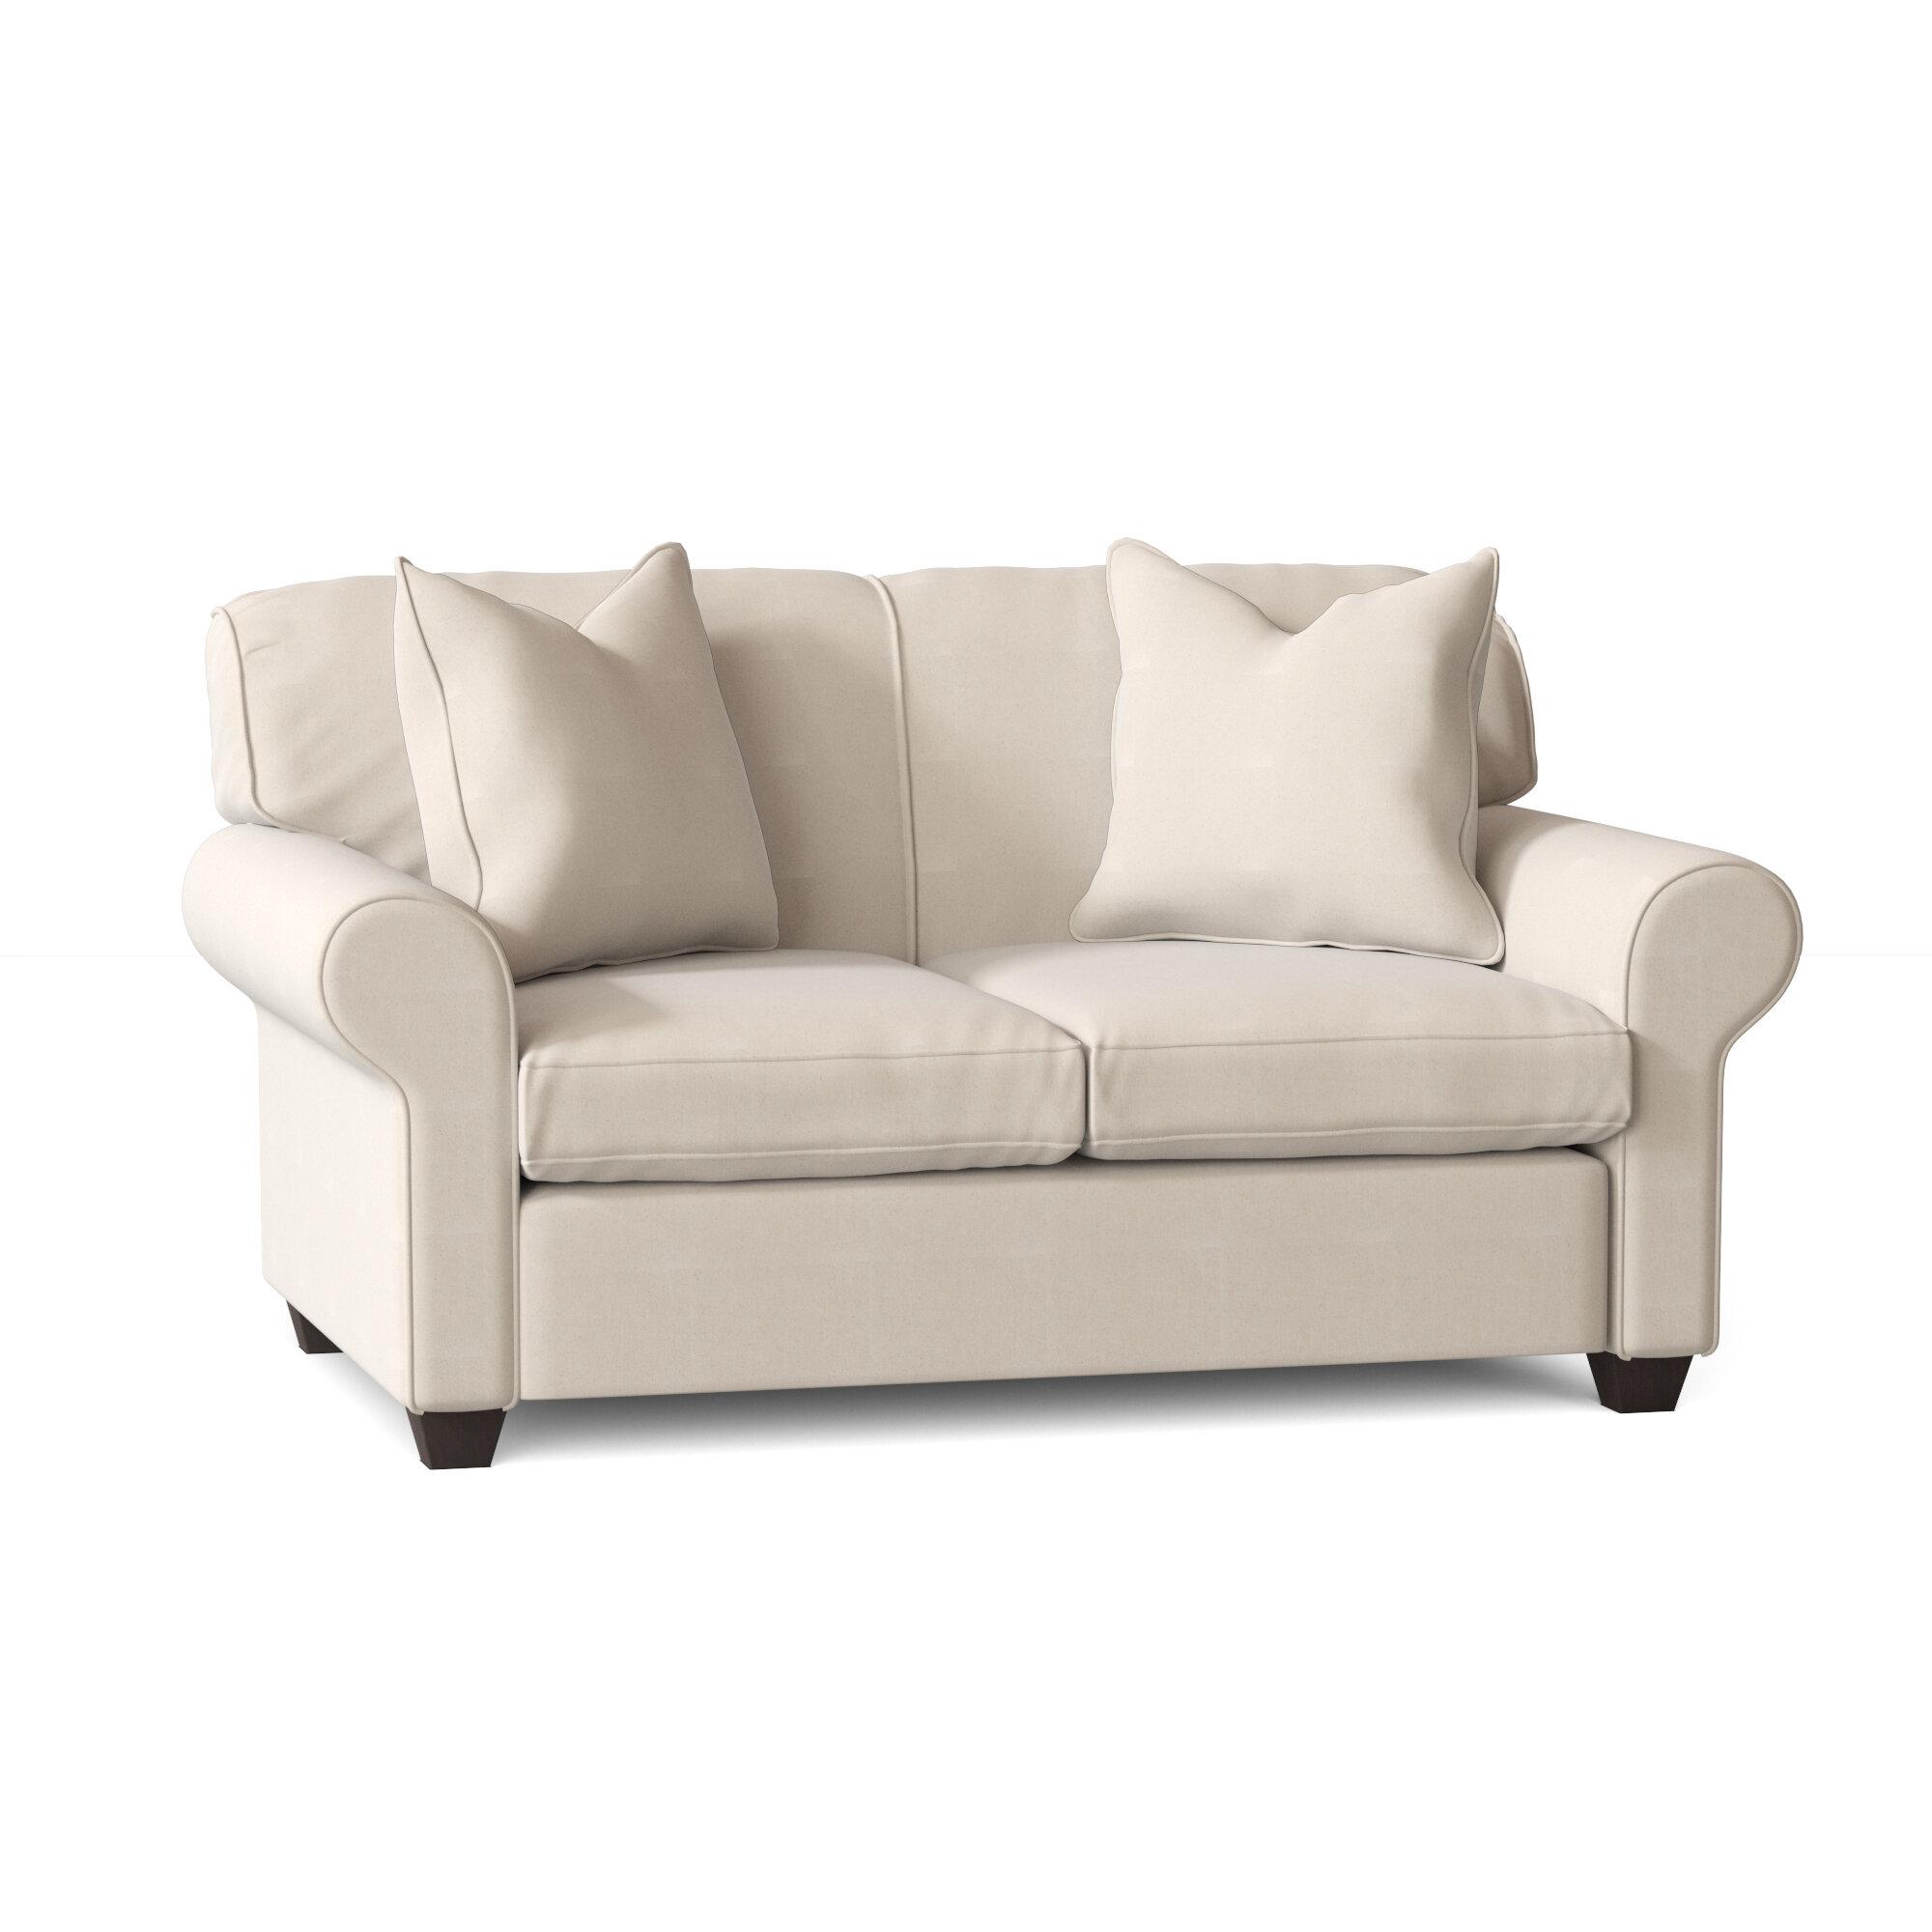 Wayfair Custom Upholstery Jennifer 59 Rolled Arm Loveseat Reviews Wayfair